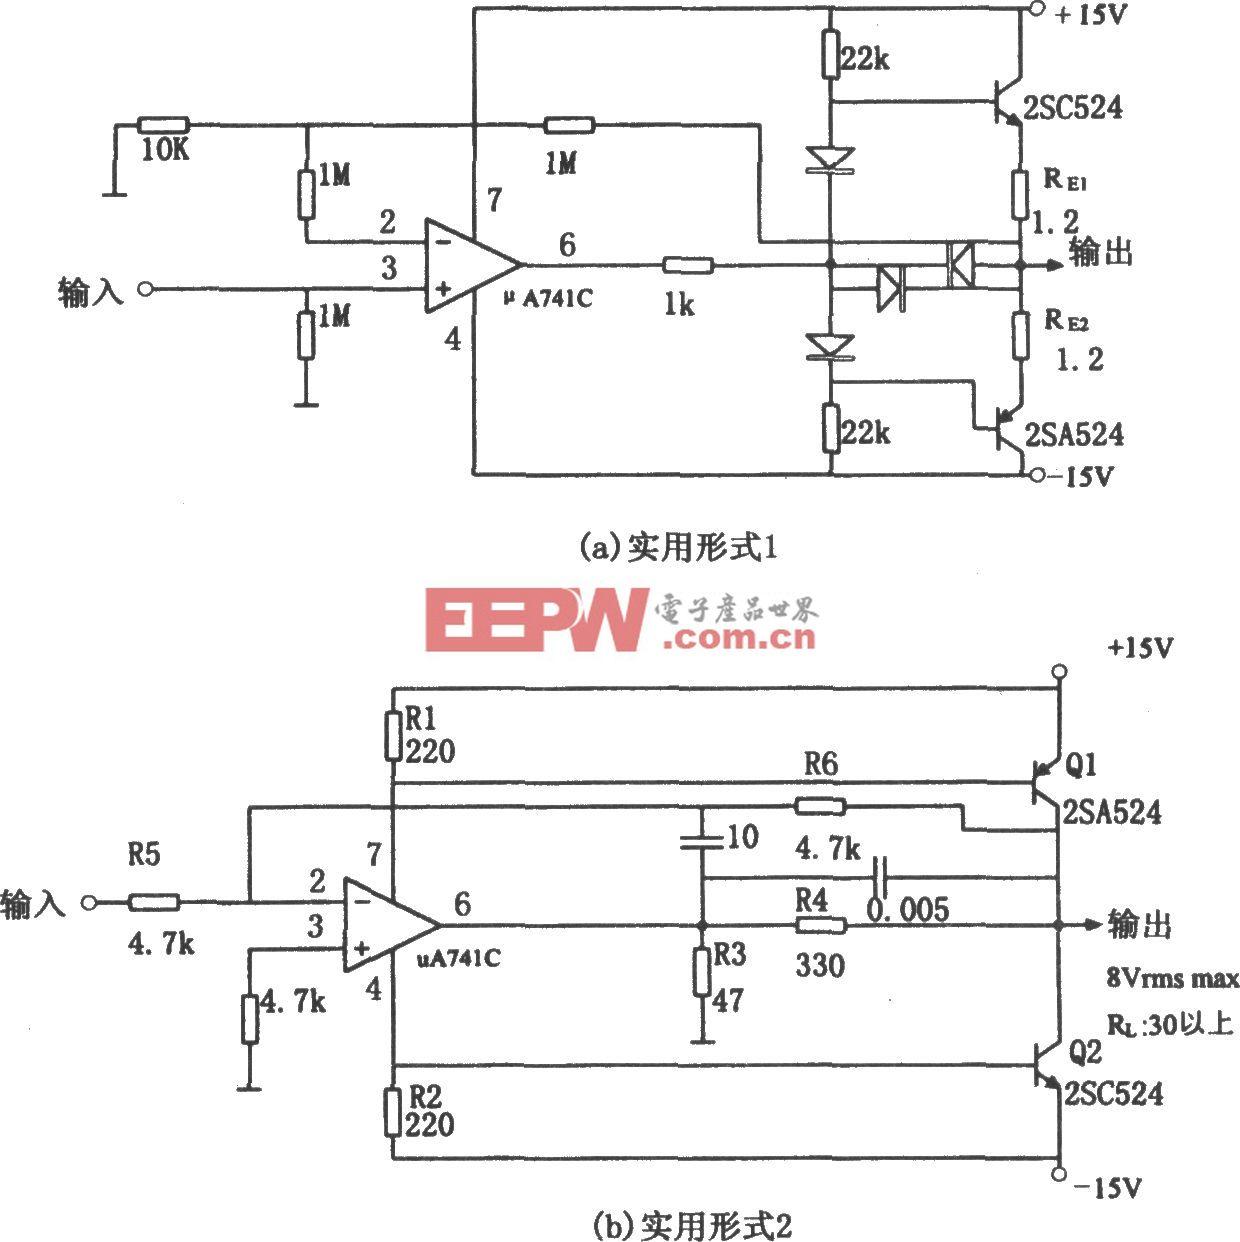 μA741构成的直接耦合音频功率放大器